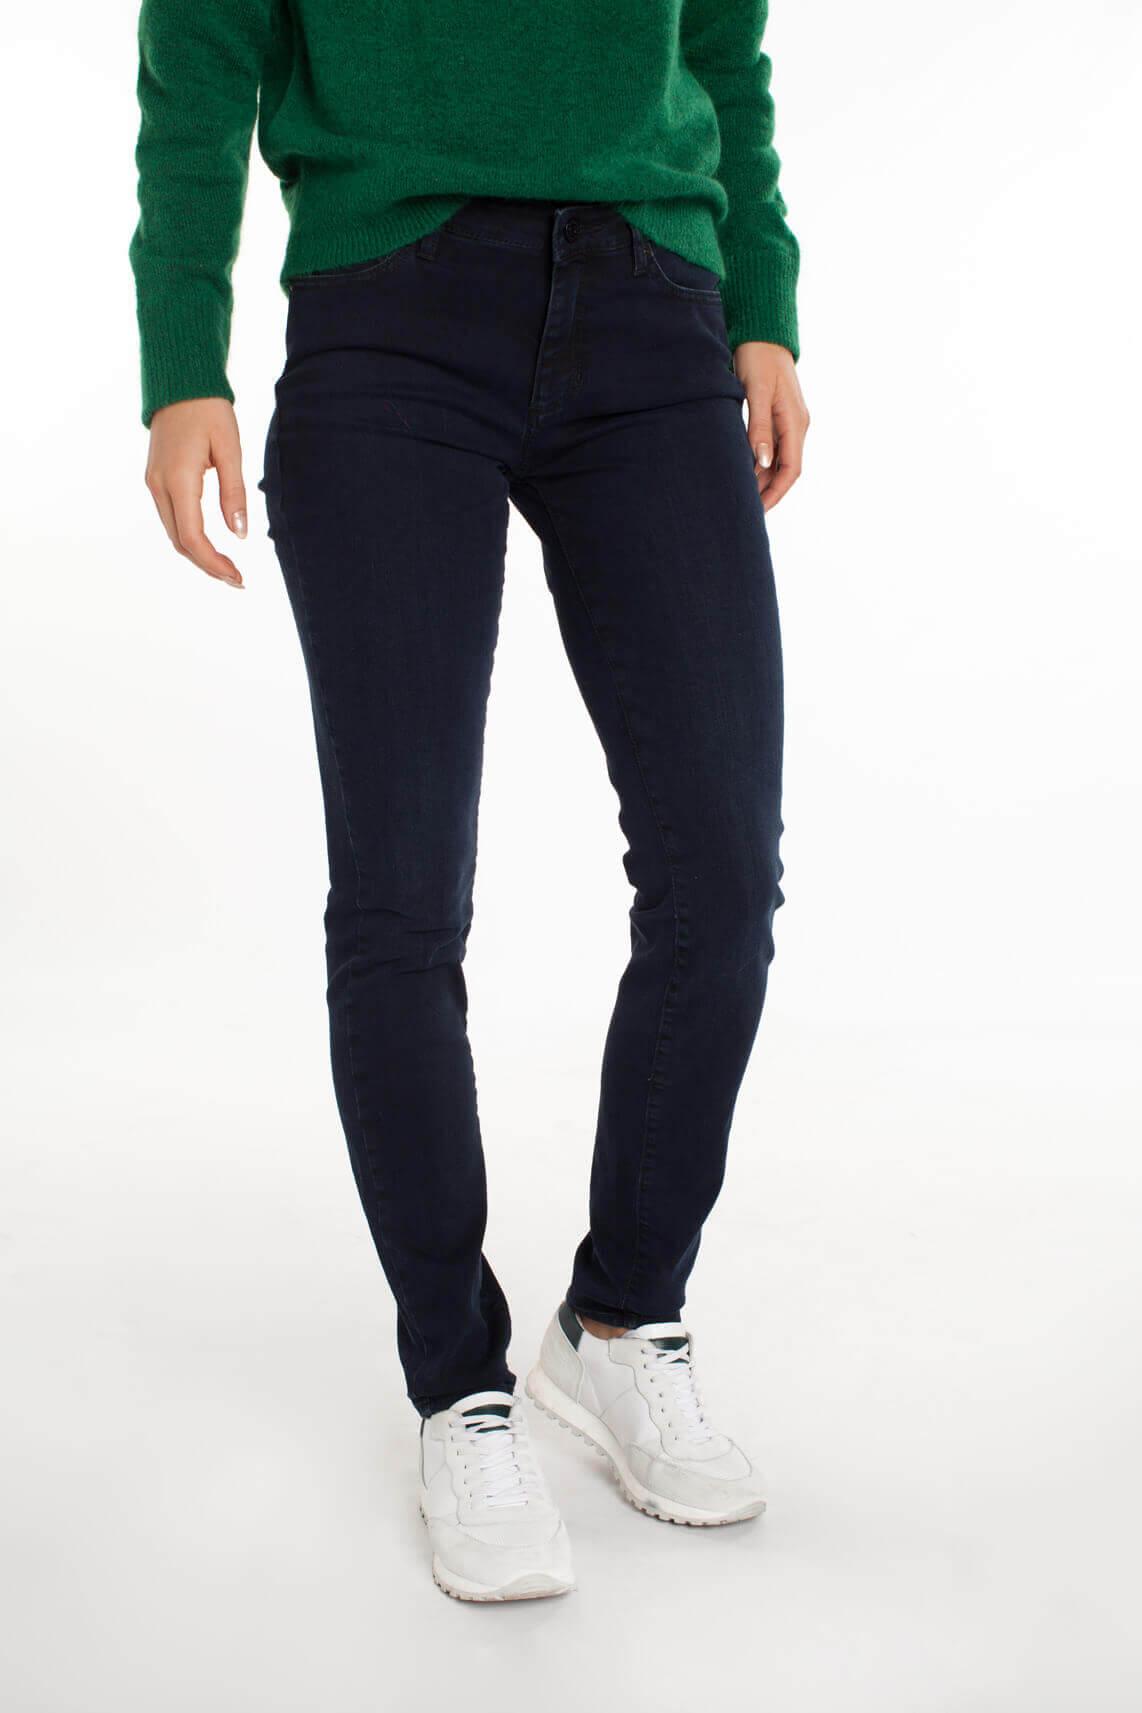 Rosner Dames Antonia skinny jeans Blauw